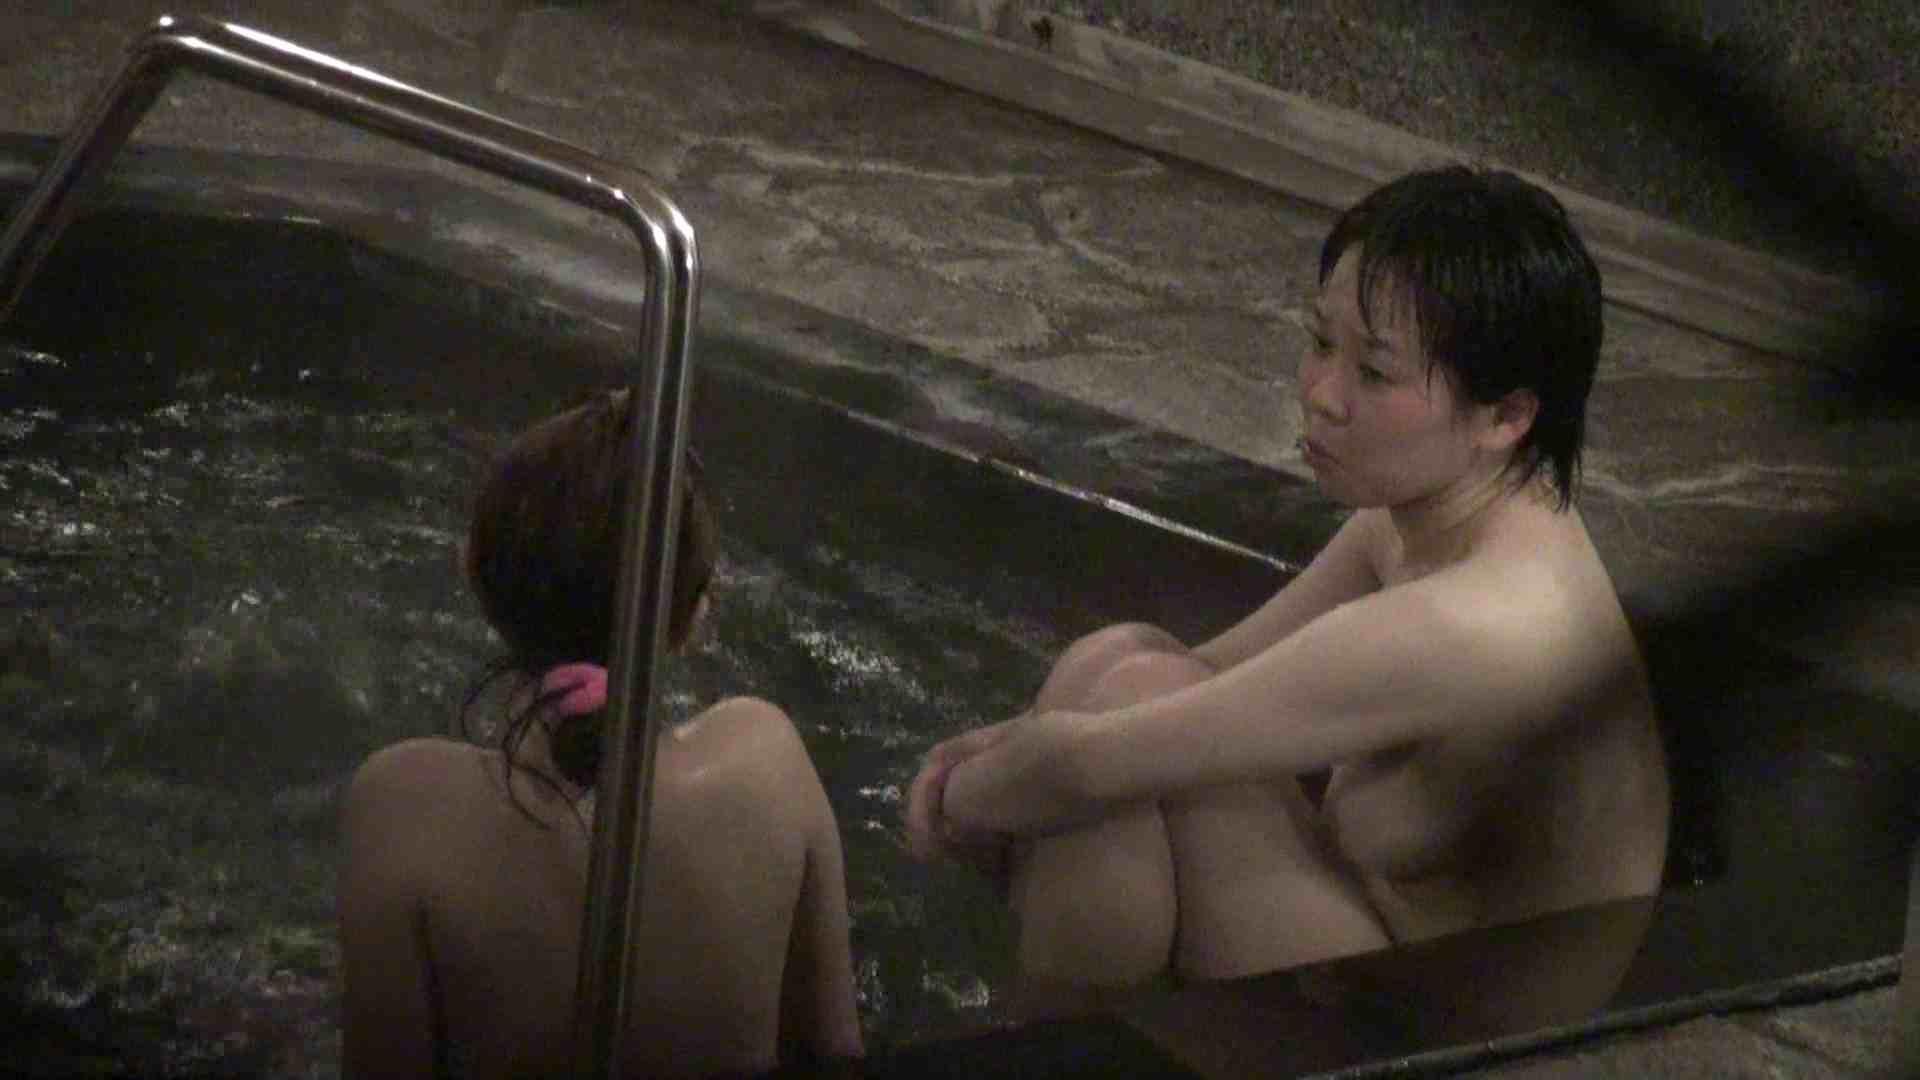 Aquaな露天風呂Vol.394 露天風呂突入 盗撮動画紹介 70pic 5